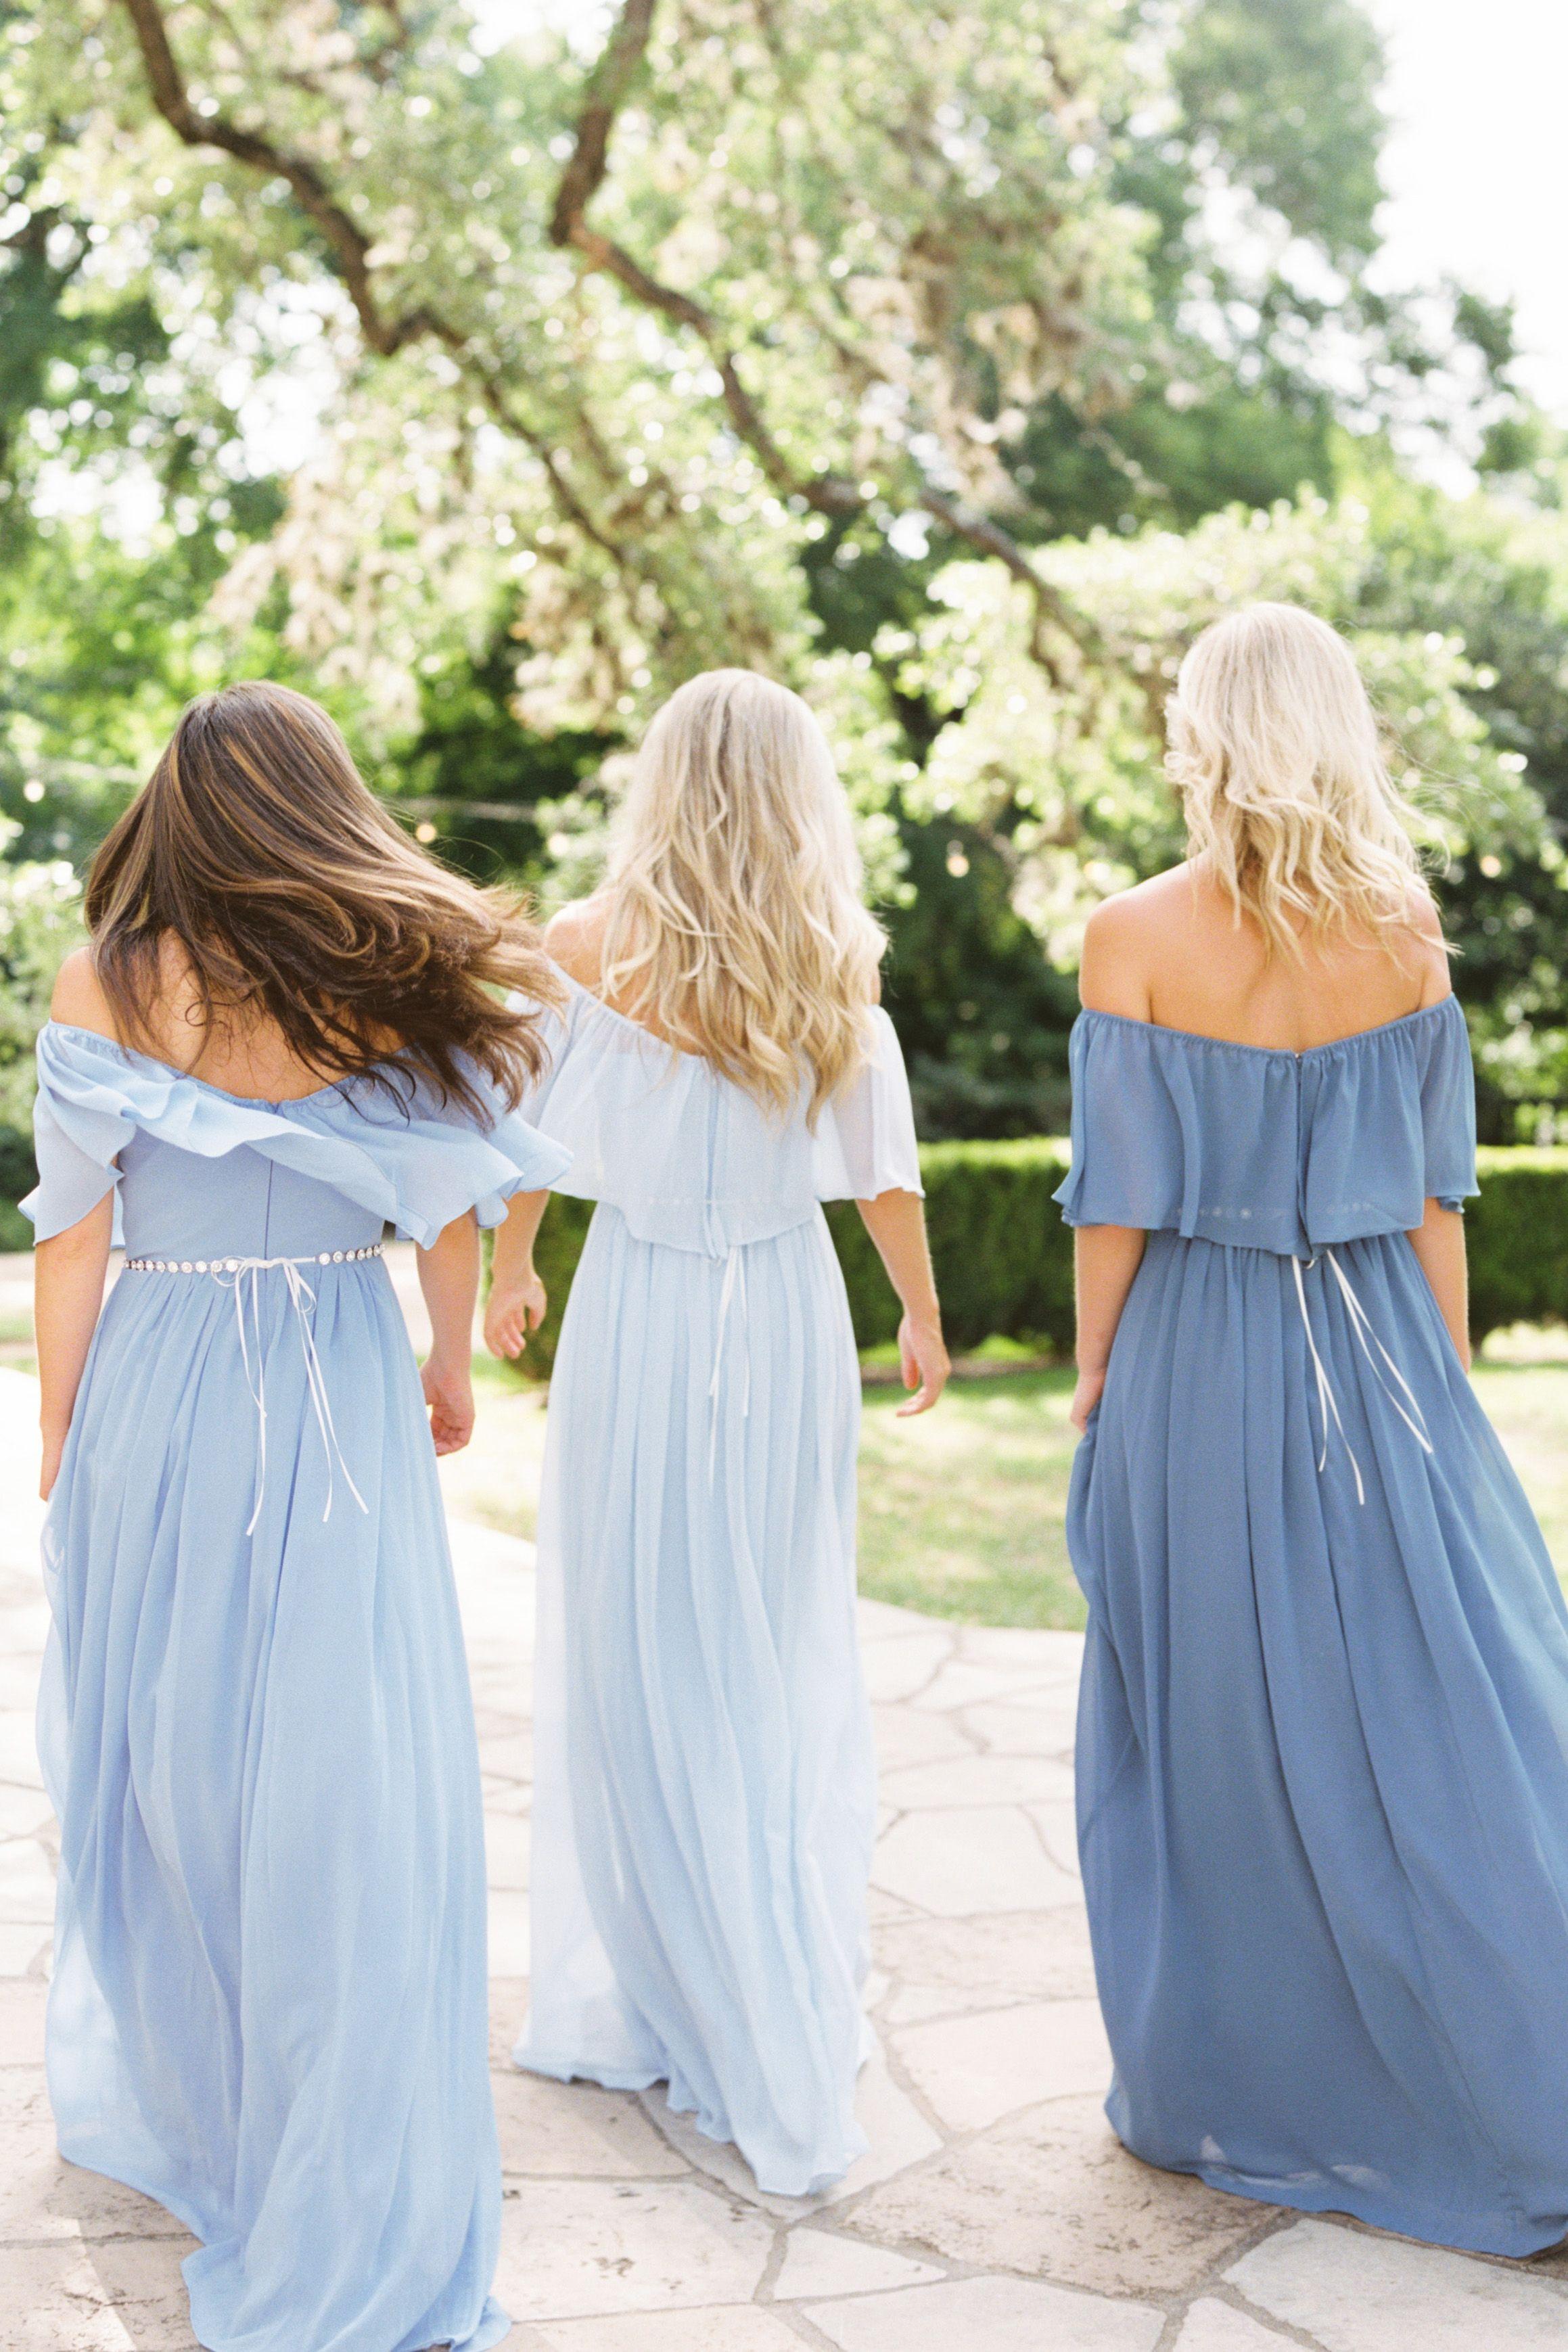 Boho off the shoulder bridesmaid dress #bridesmaids